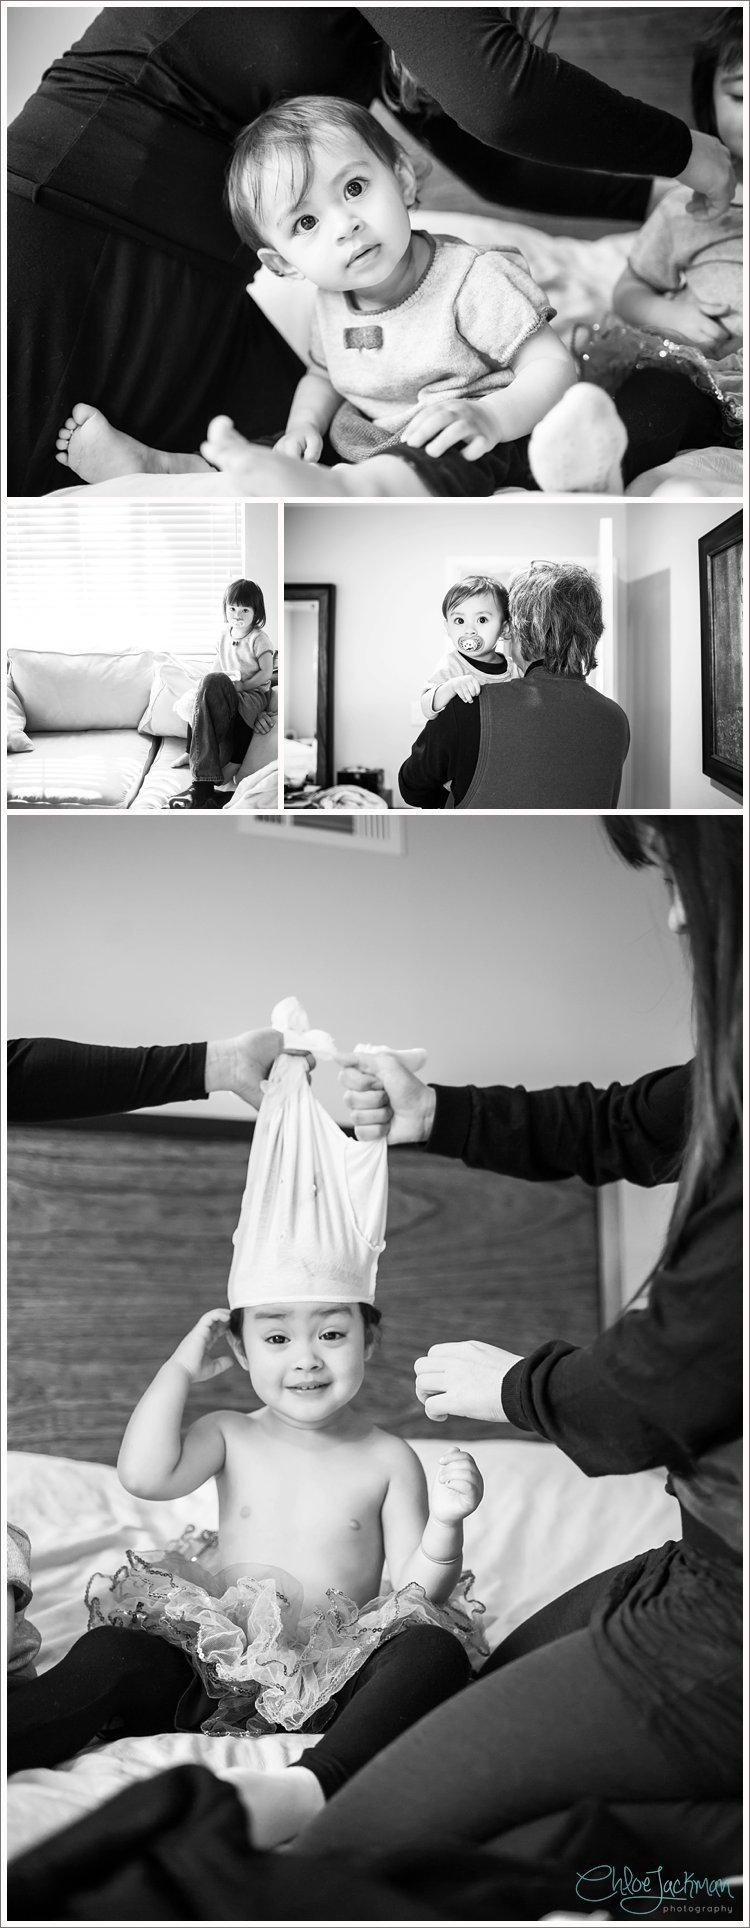 Chloe-Jackman-Photography-Giovonni-Newborn-2015-100